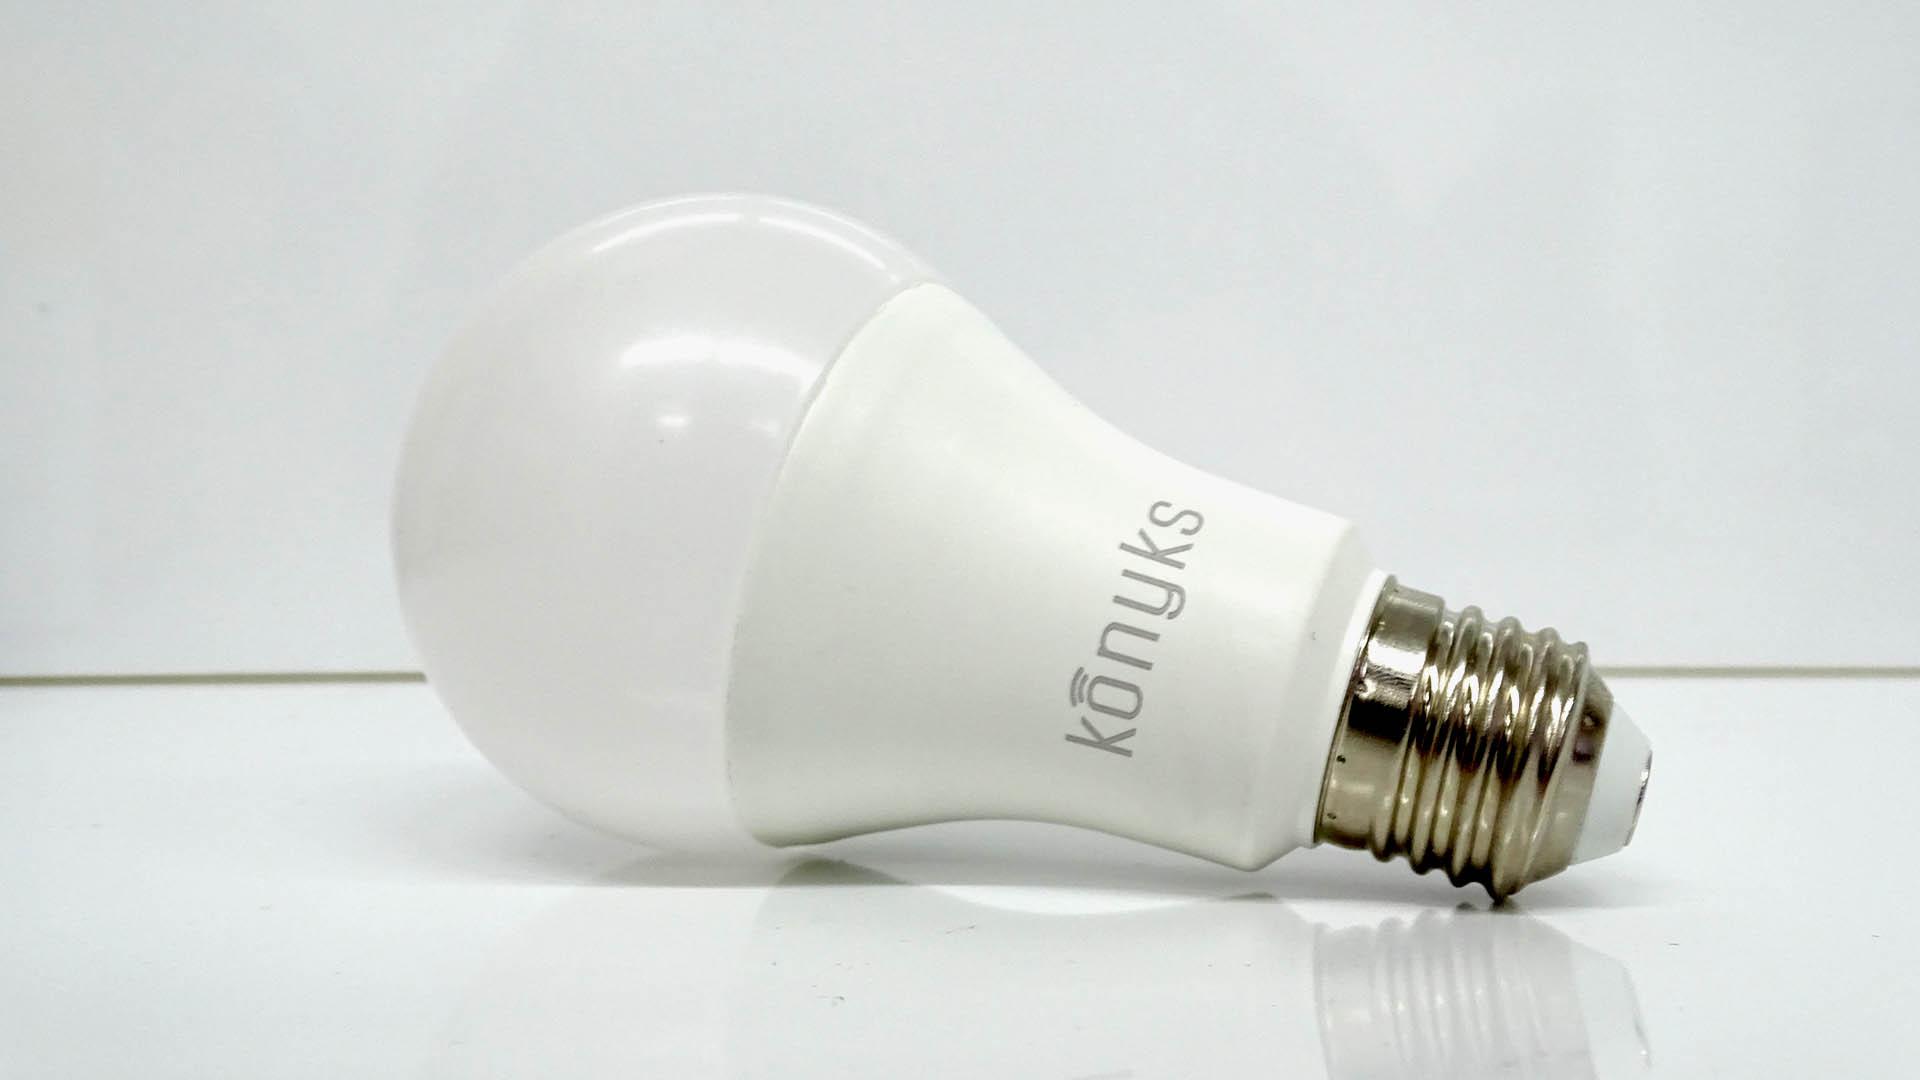 Antalya, l'ampoule WiFi RGB de Konyks compatible Google Home et Alexa